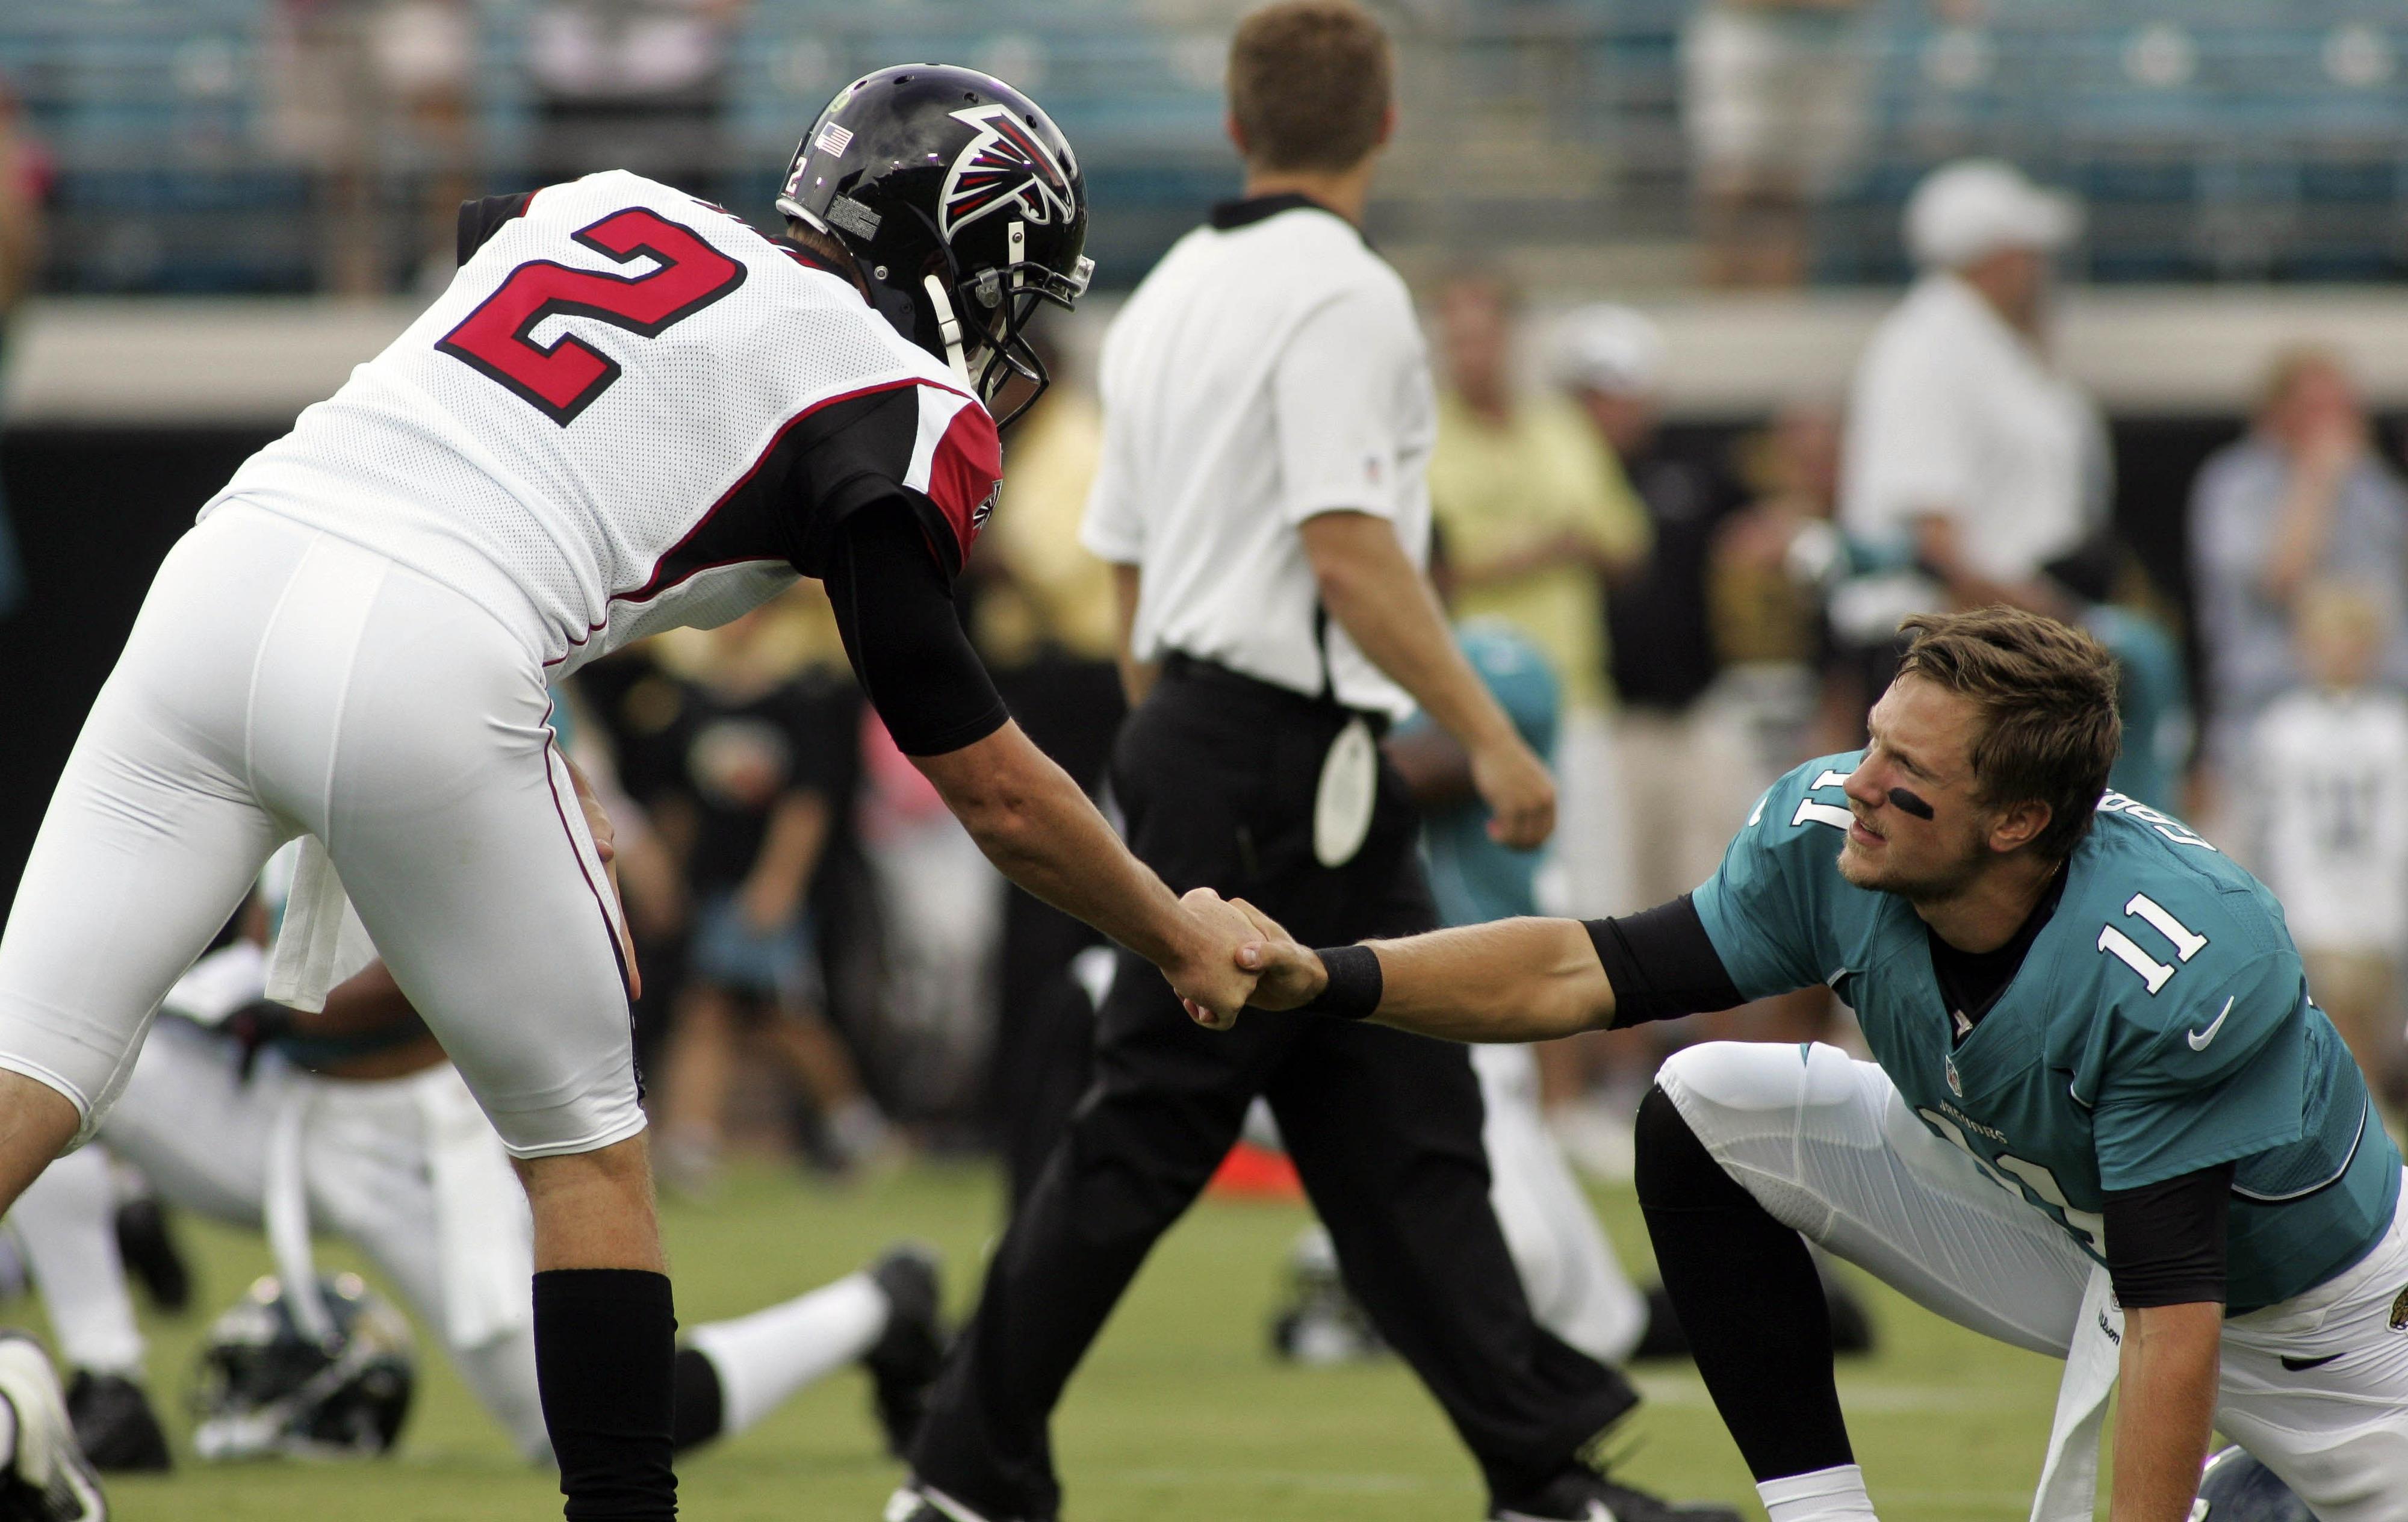 August 30, 2012; Jacksonville FL, USA; Atlanta Falcons quarterback Matt Ryan (2) shakes hands with Jacksonville Jaguars quarterback Blaine Gabbert (11) before the start of their game at EverBank Field. Mandatory Credit: Phil Sears-US PRESSWIRE